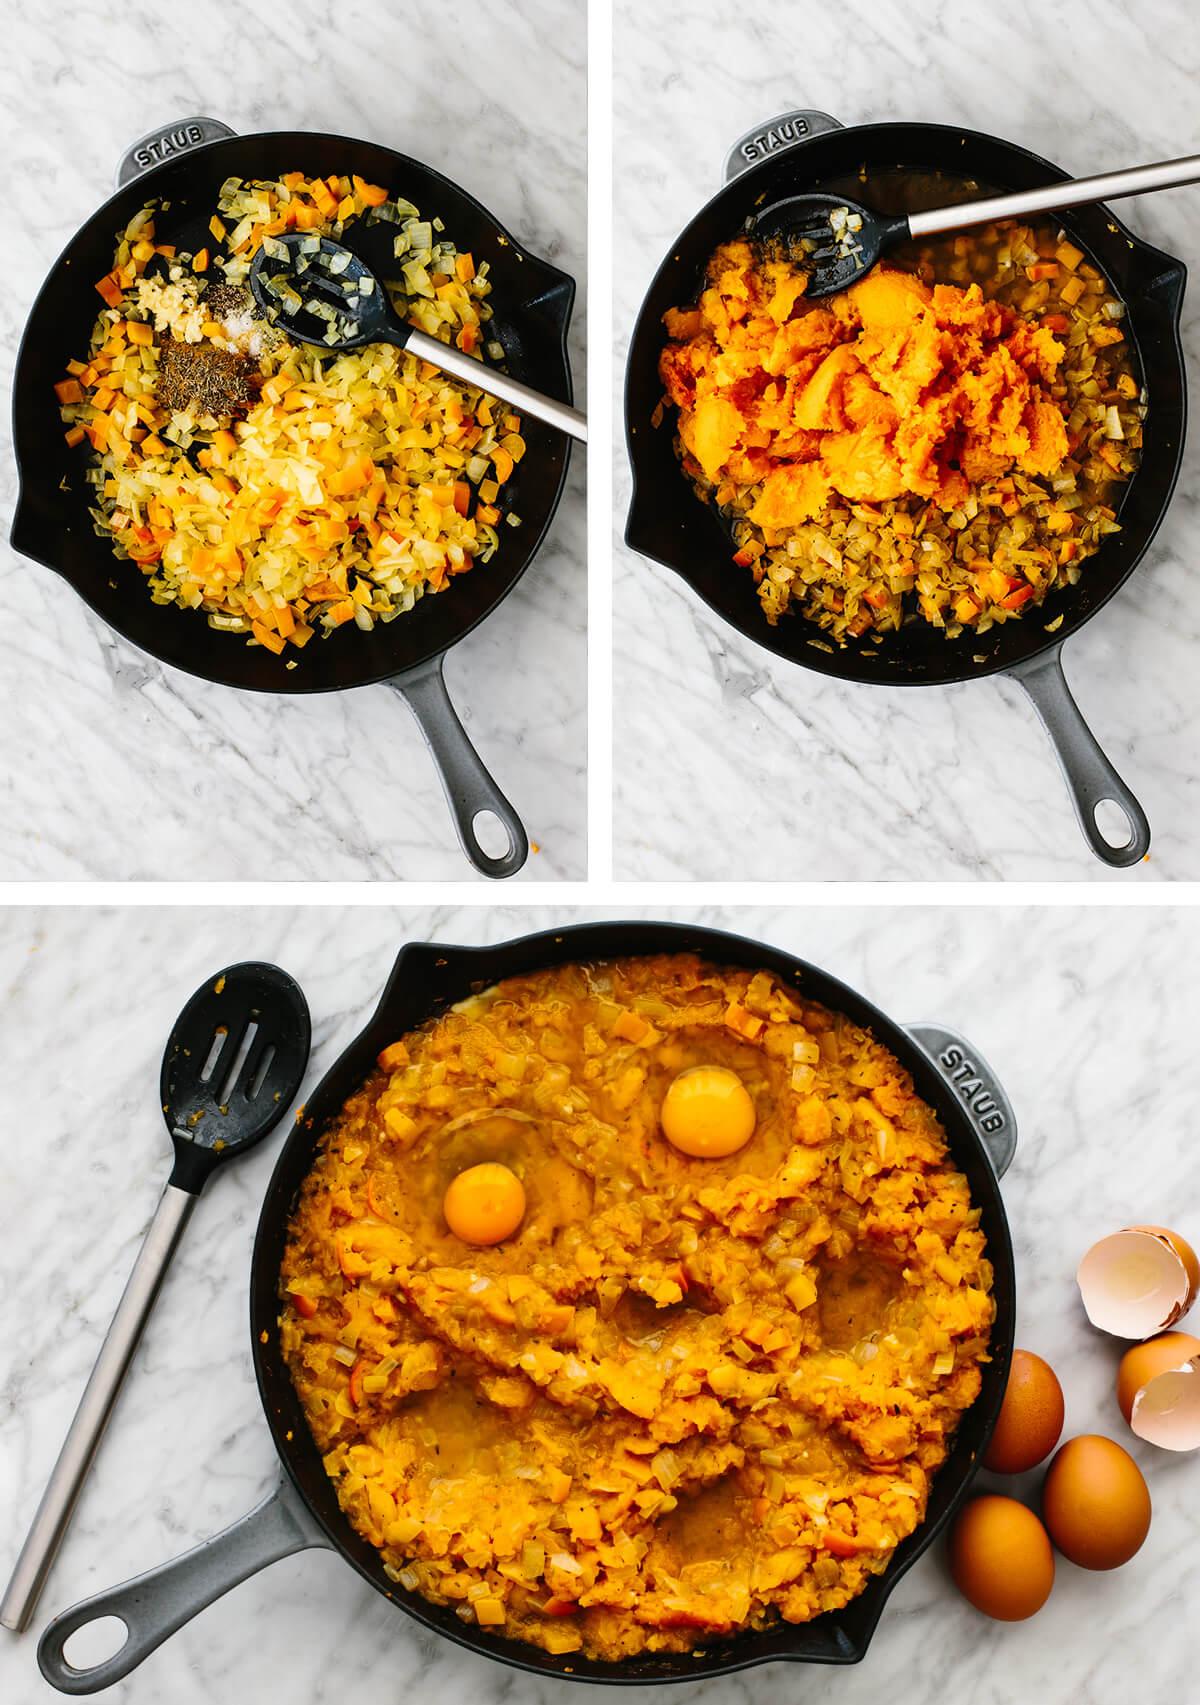 Sauteing ingredients for an orange shakshuka in a skillet.